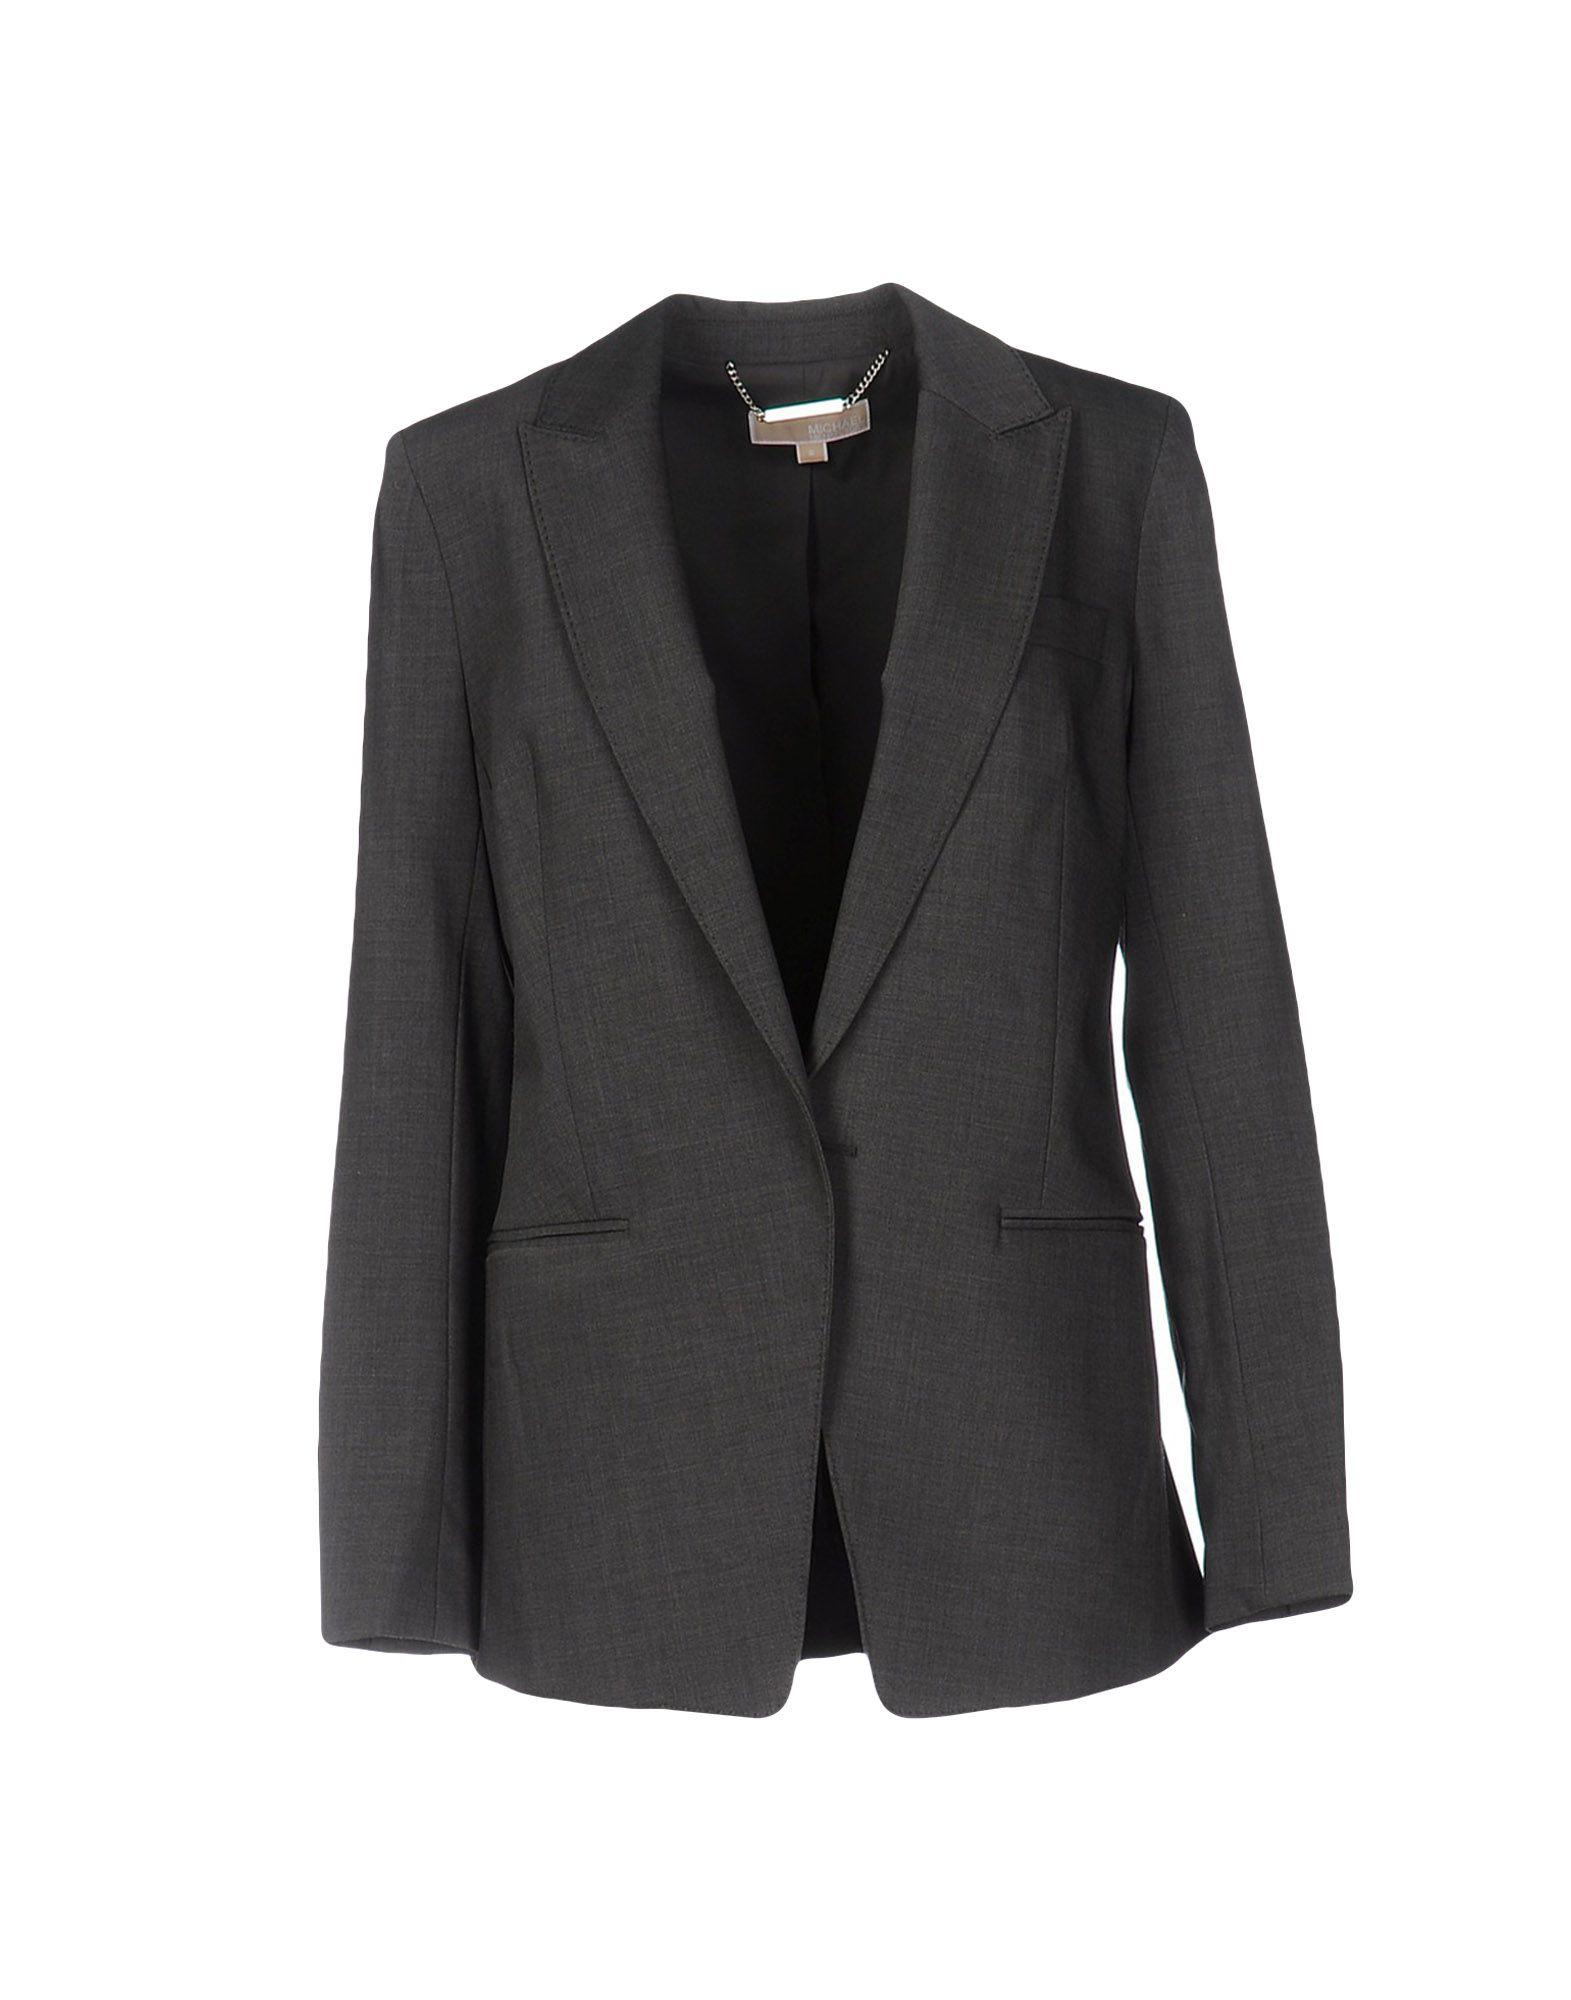 MICHAEL KORS Damen Jackett Farbe Grau Größe 4